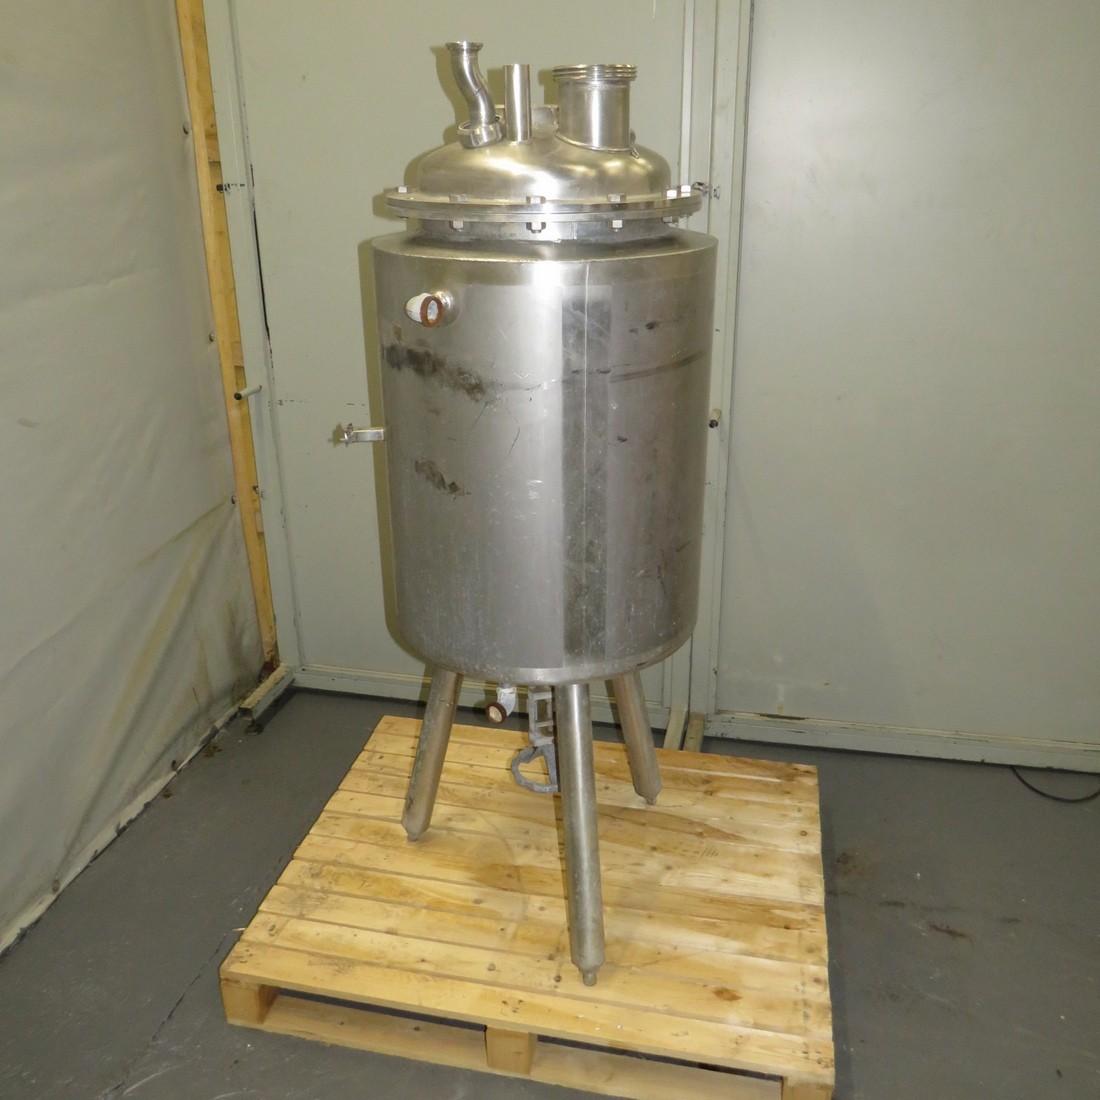 R11DB22686Stainless steel PROMINOX vessel - 80 liters - Double jacket